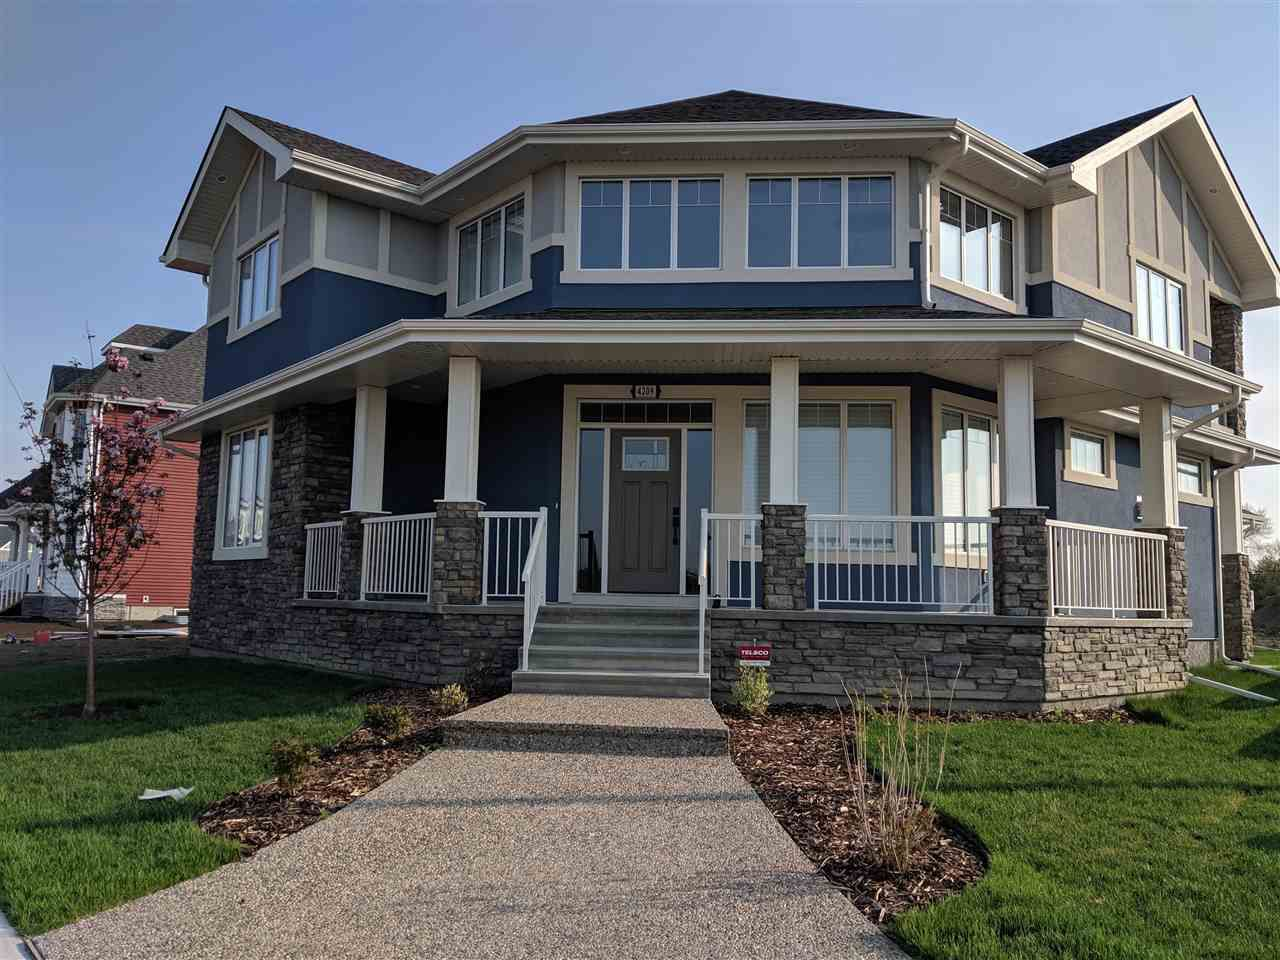 Main Photo: 4209 Veterans Way in Edmonton: Zone 27 House for sale : MLS®# E4159055